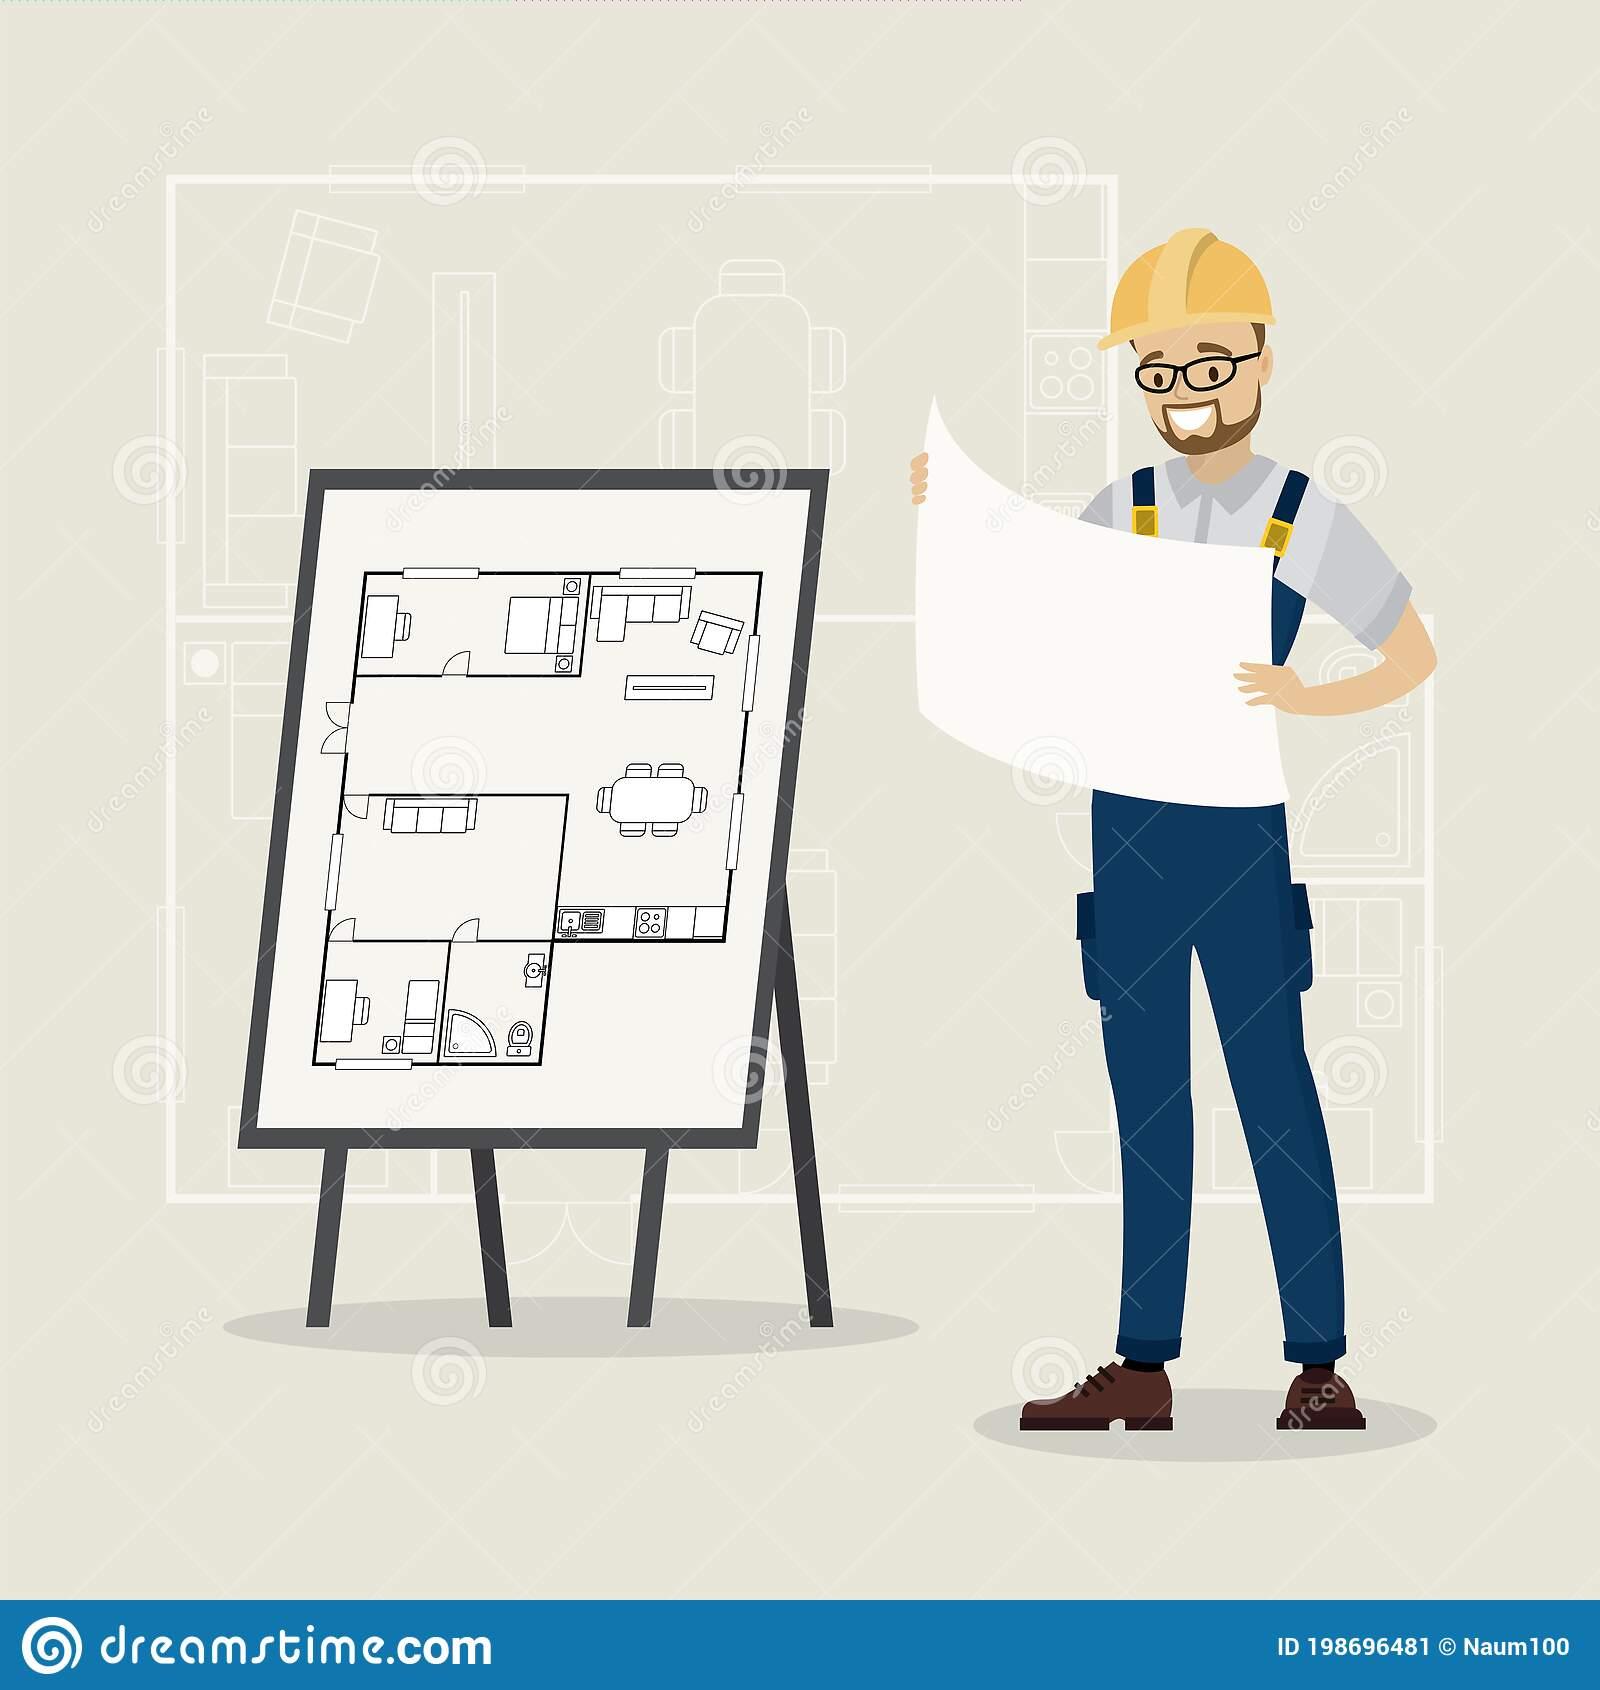 plano-de-edificio-o-apartamento-bordo-hombre-dibujos-animados-ingeniero-arquitecto-con-proyecto-en-manos-caricatura-198696481 (1)